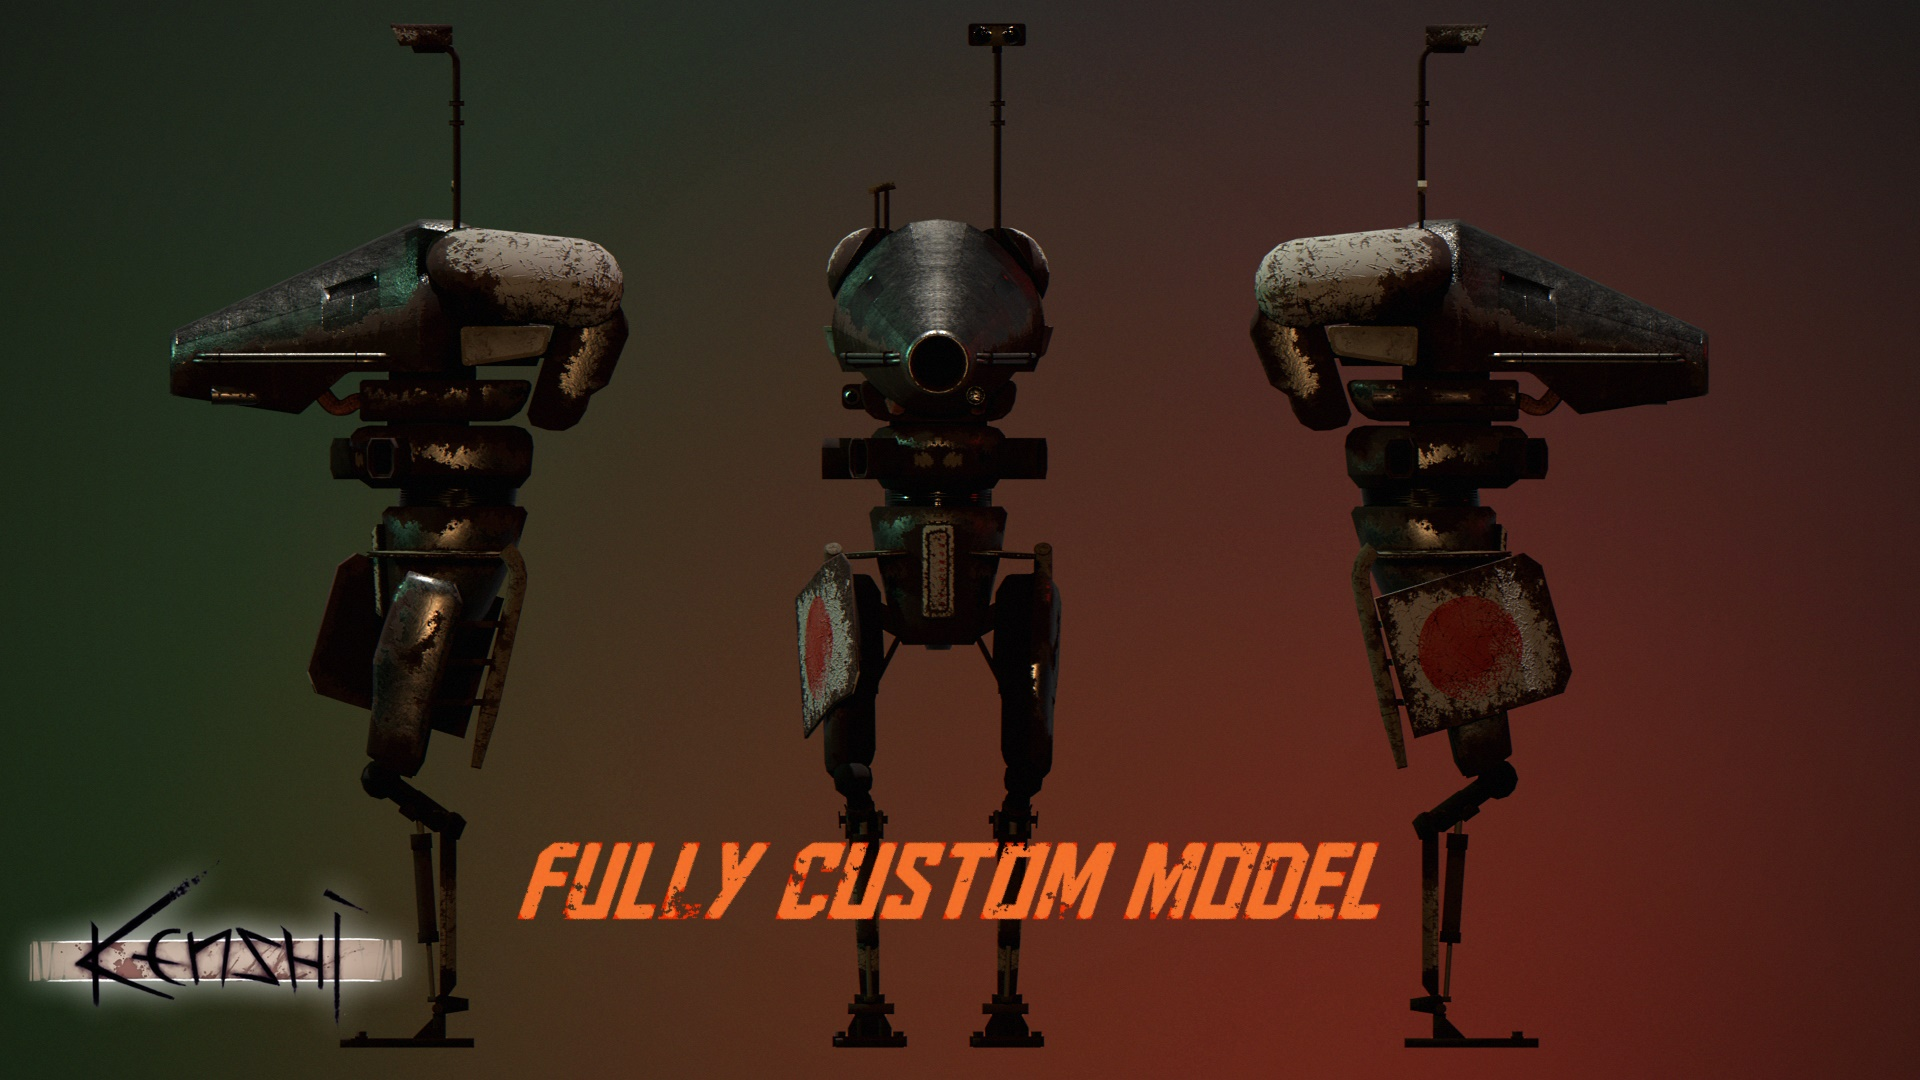 Thrashers - New 'Old Machines' Enemy Type / Молотильщики - Новый (Старые машины) тип врага (RU)